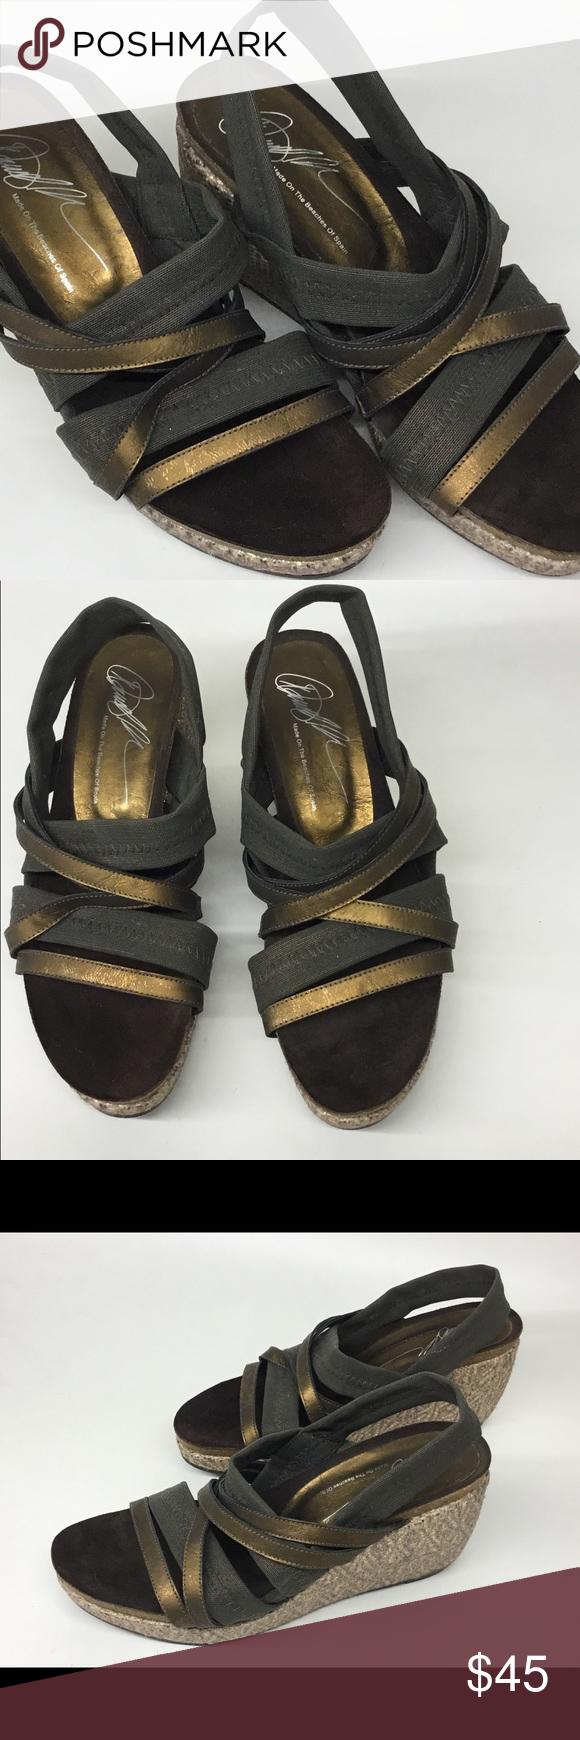 Donald J Pliner Wedge Sandals With Elastic Straps Strap Heels Wedge Sandals Sandals